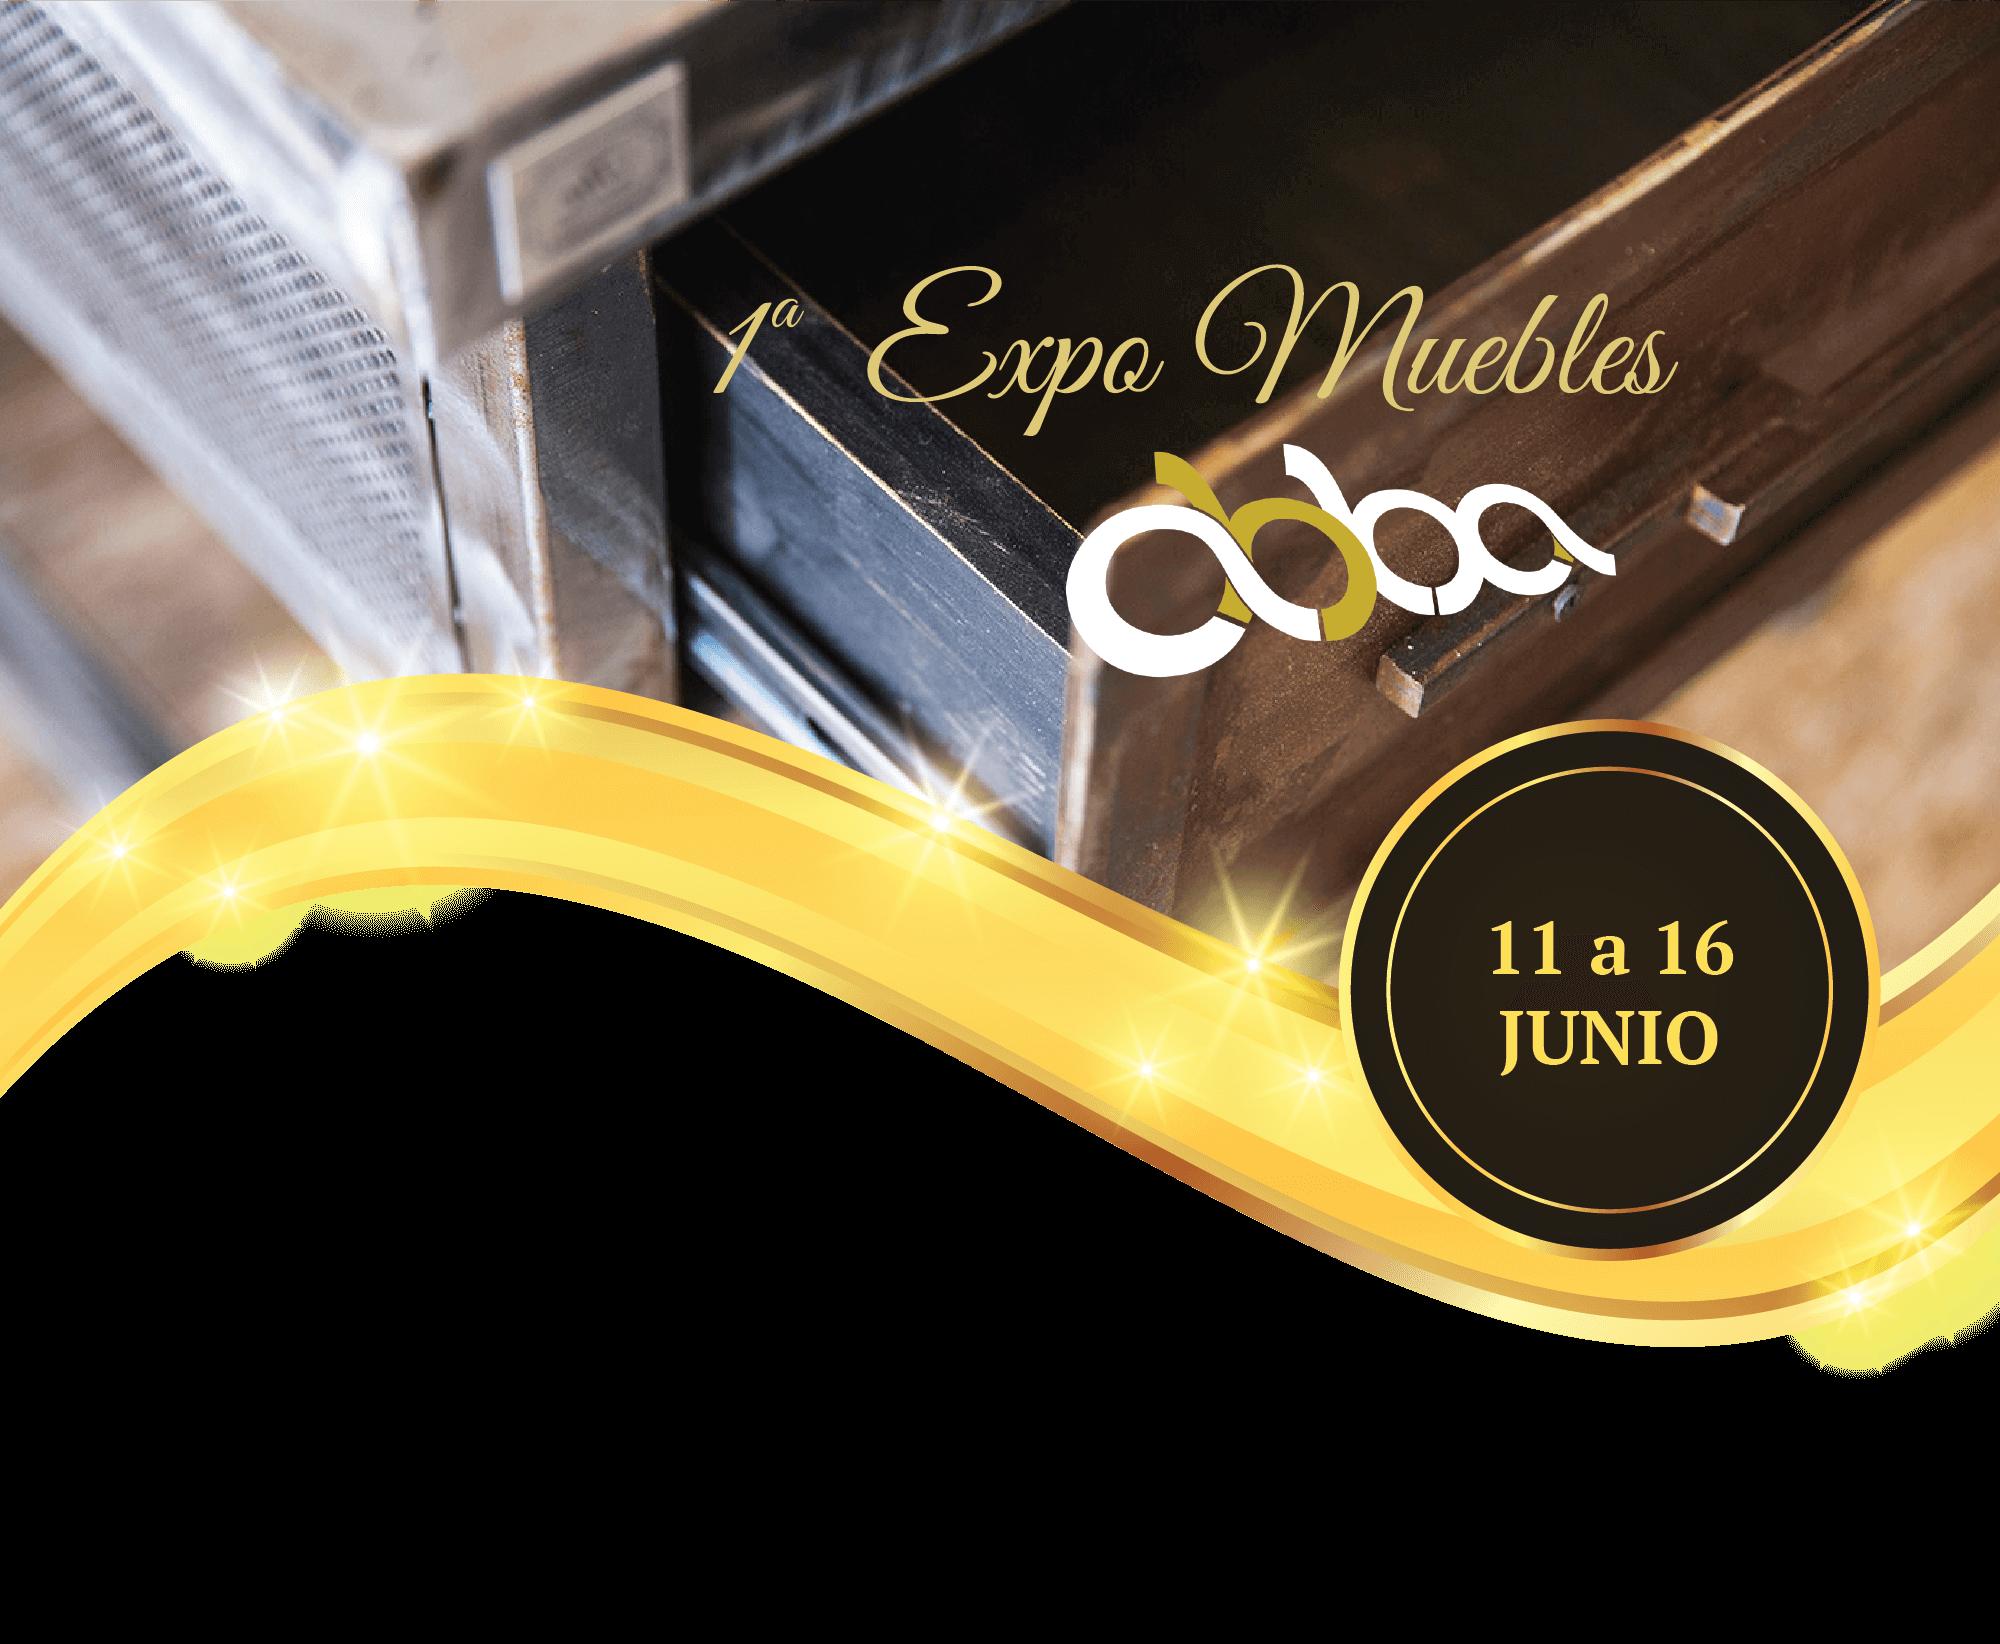 1-expo-muebles-abba-2018